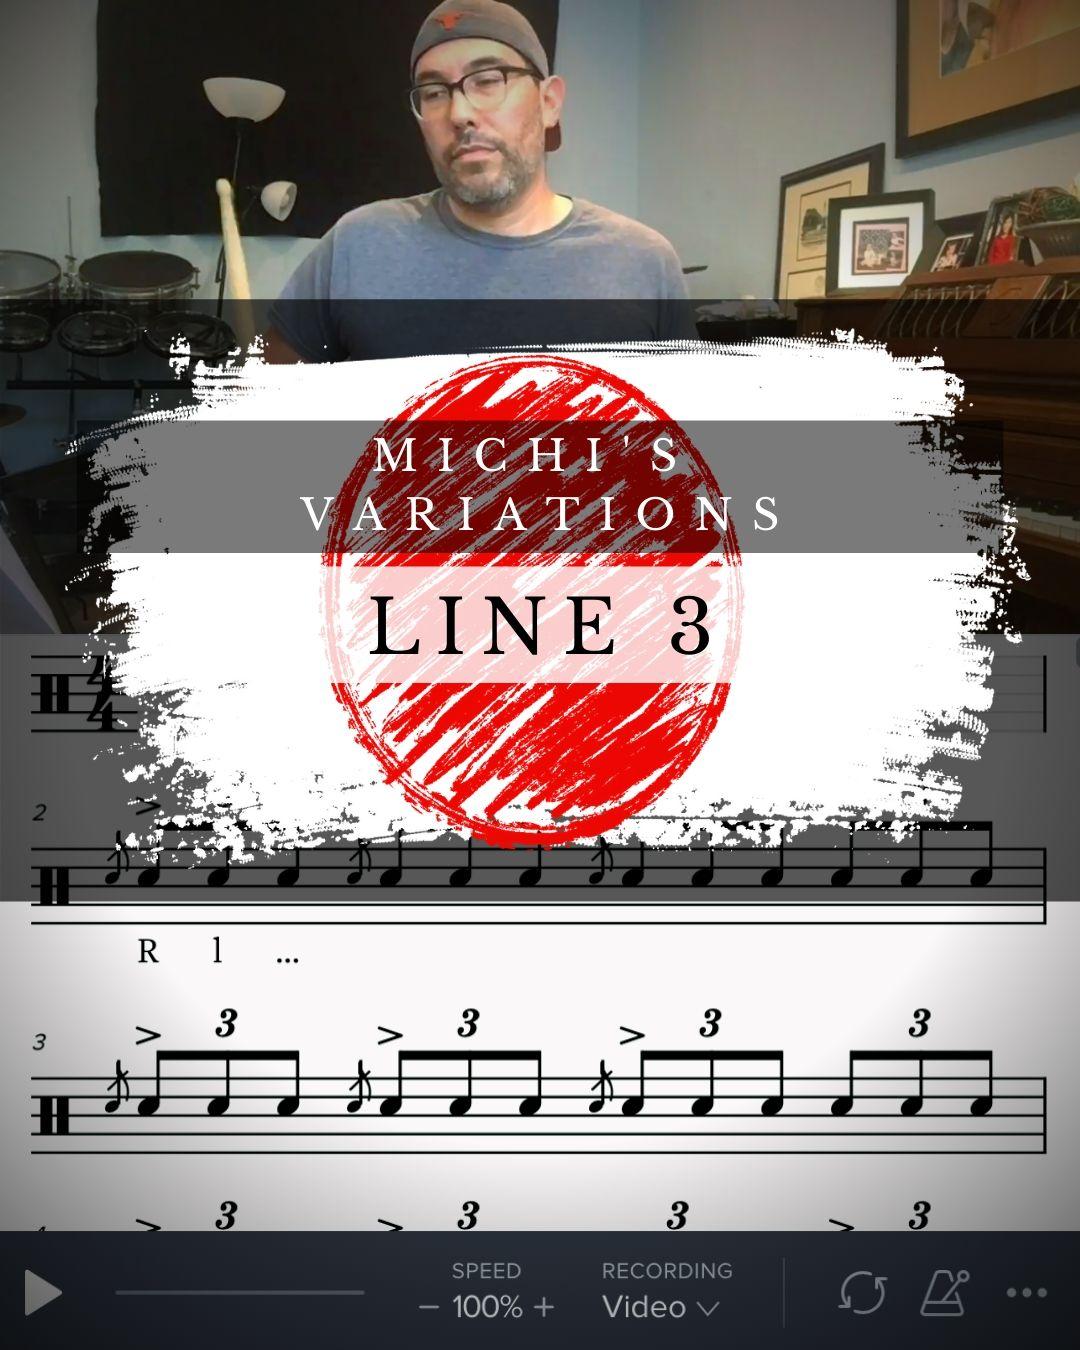 Michi's Variations Line 3